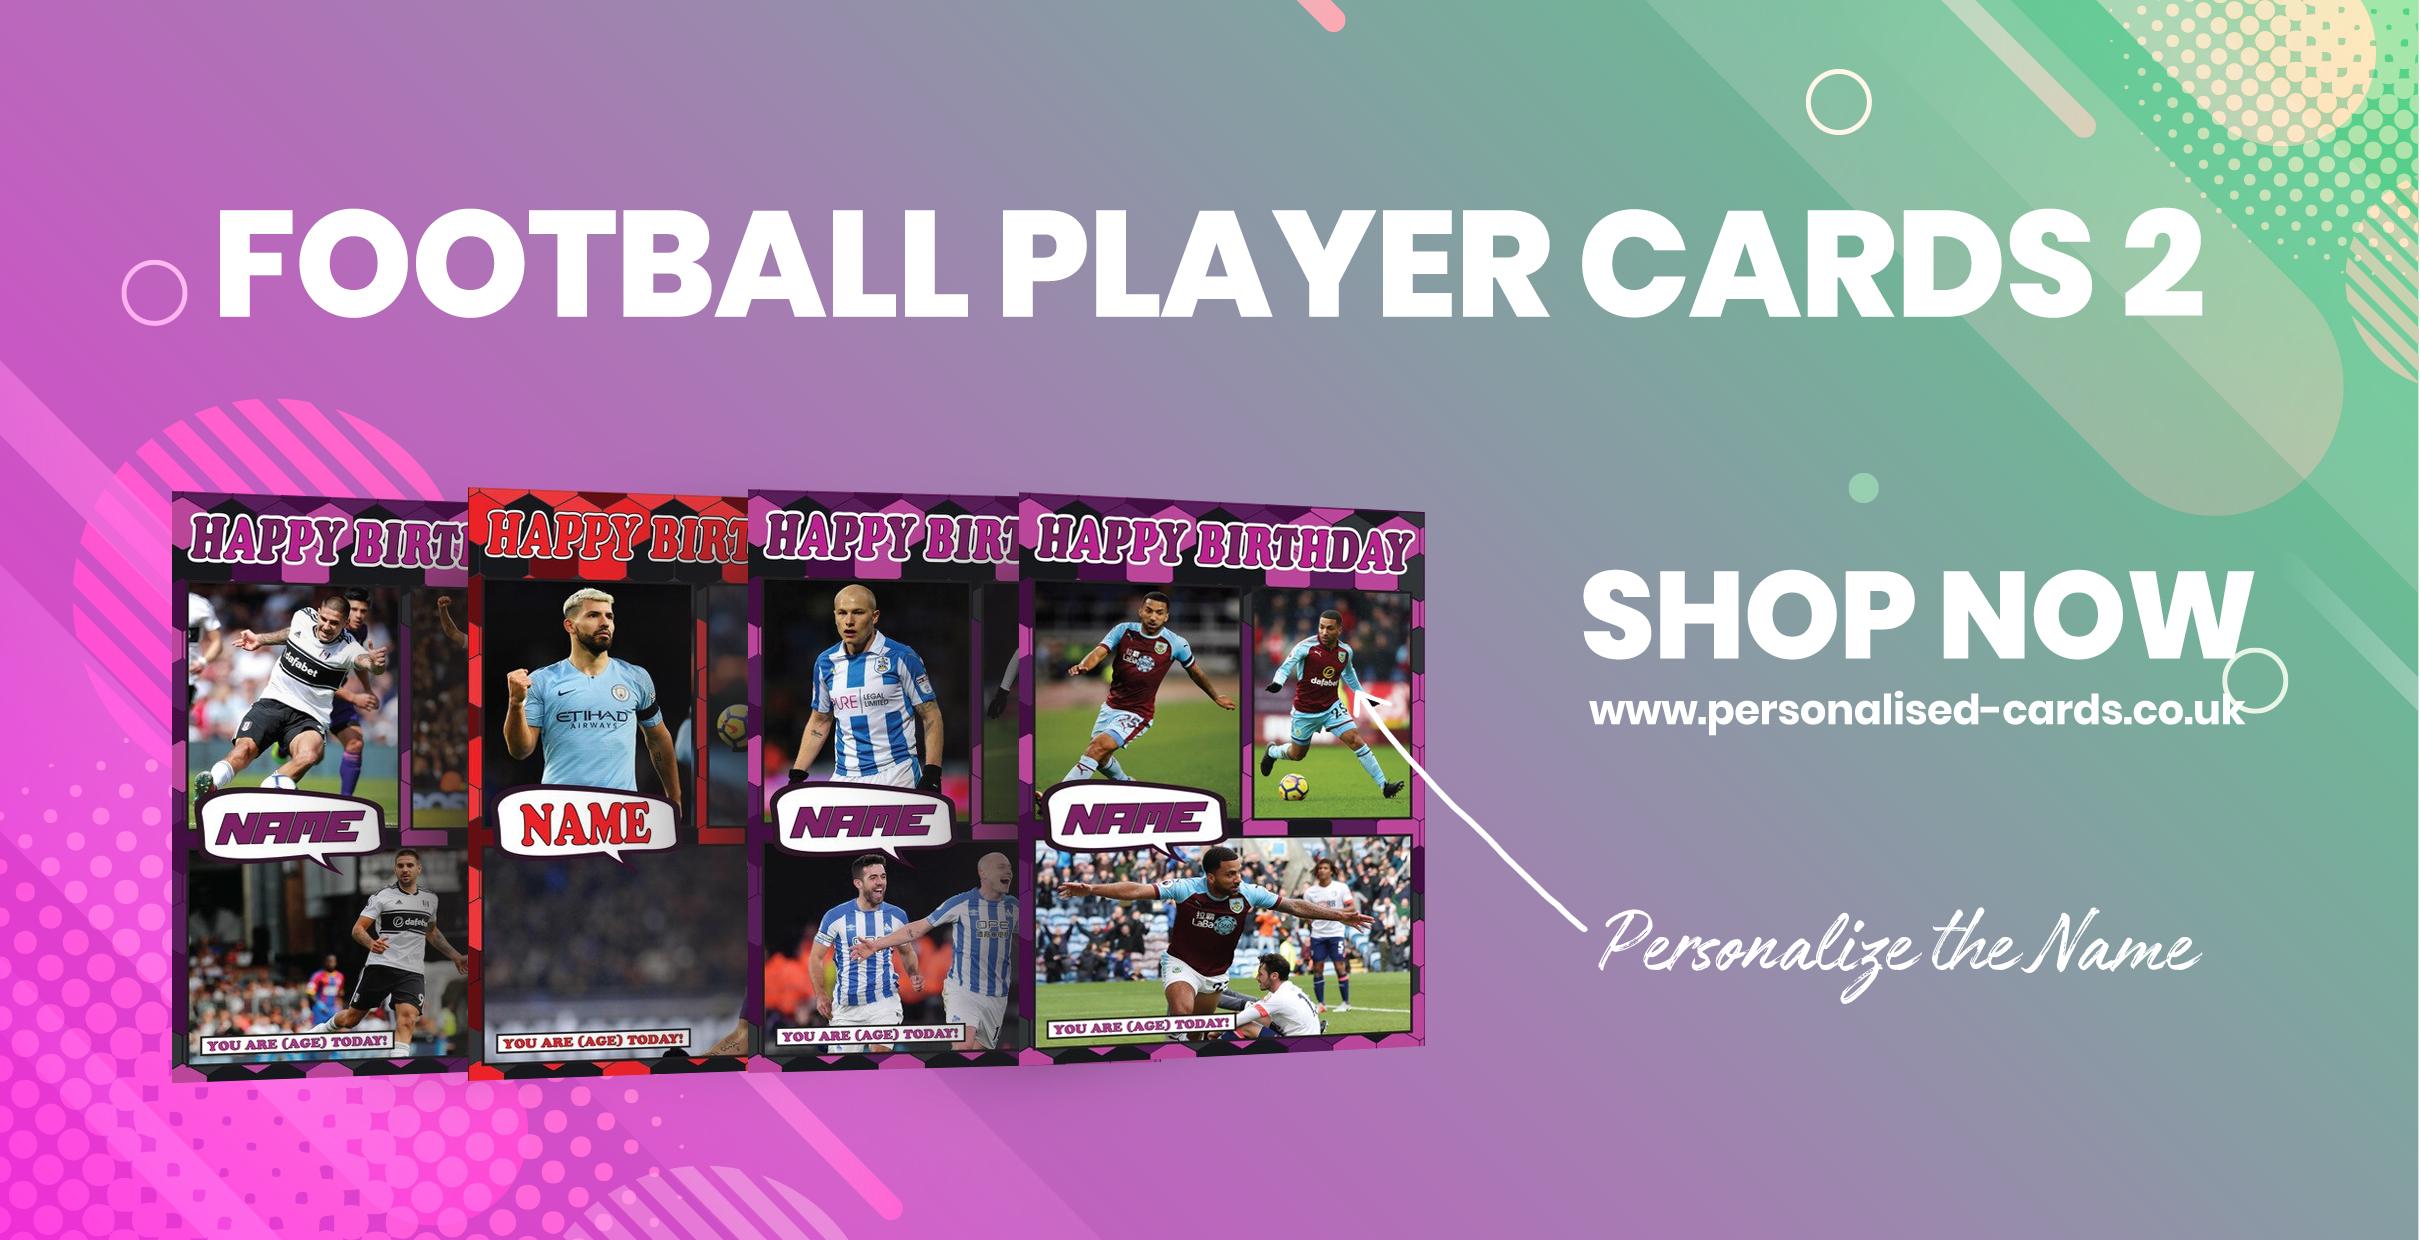 football-player-cards-2.jpg